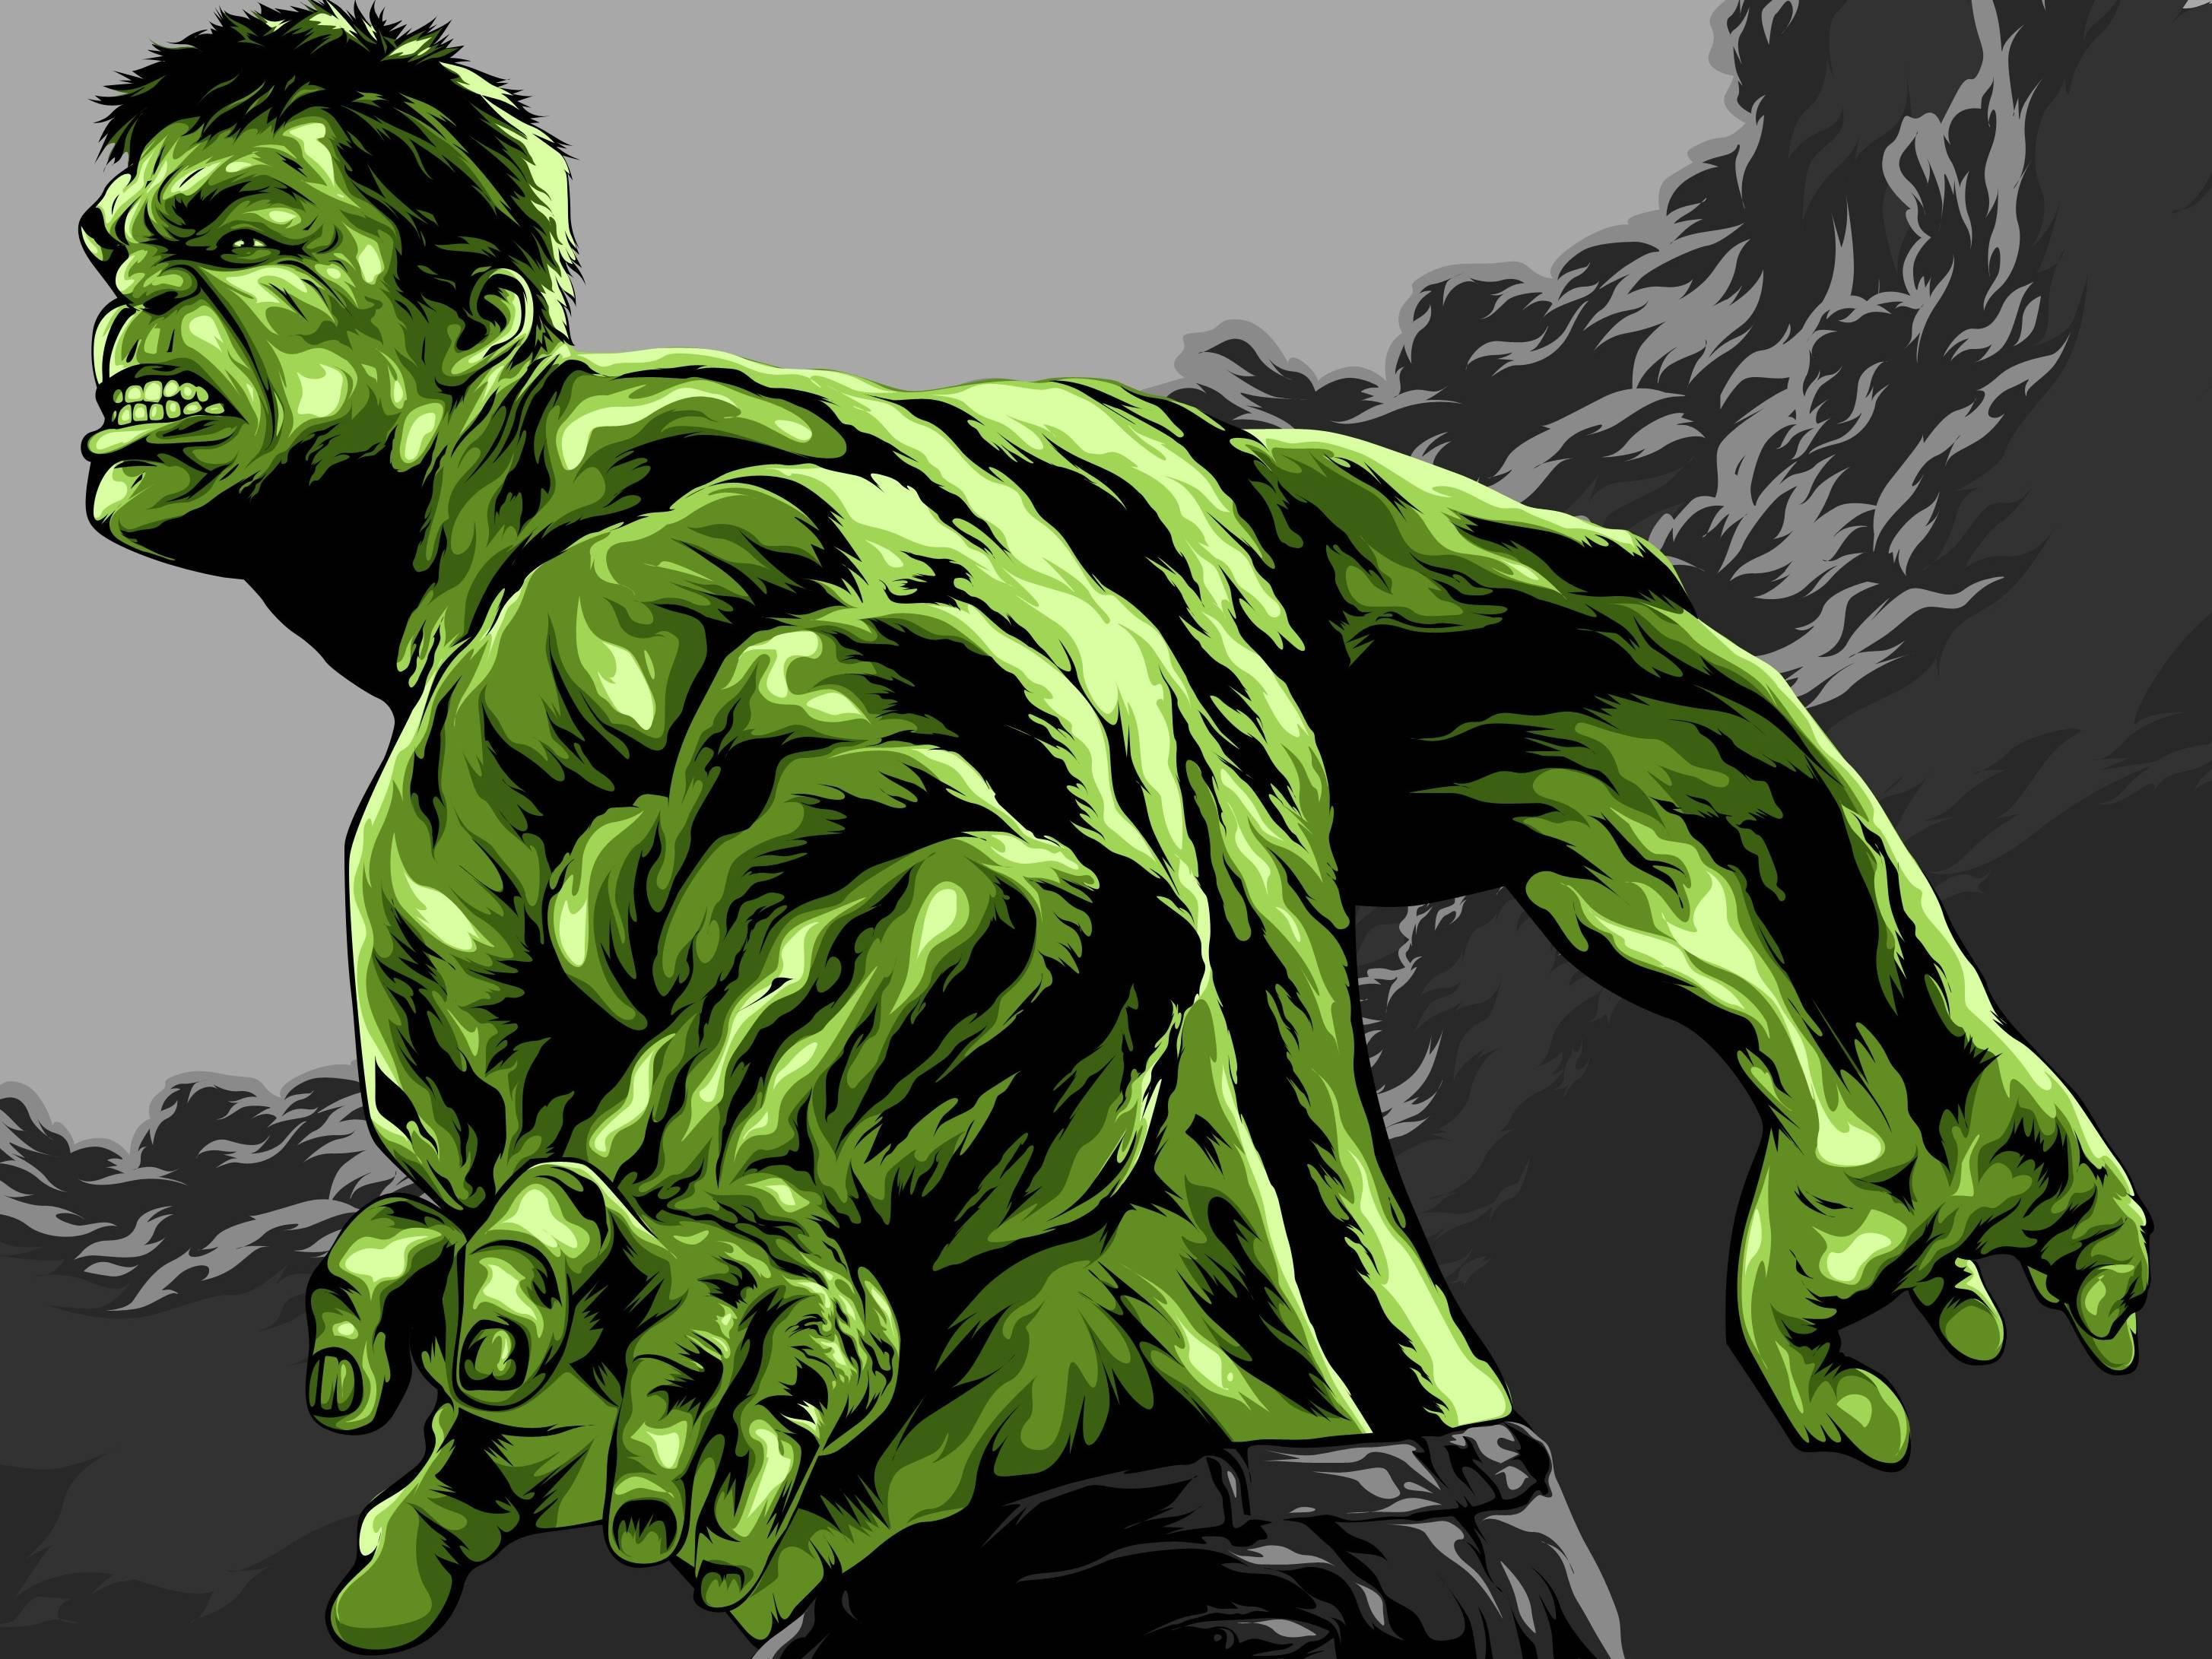 Hulk Face Wallpapers Top Free Hulk Face Backgrounds